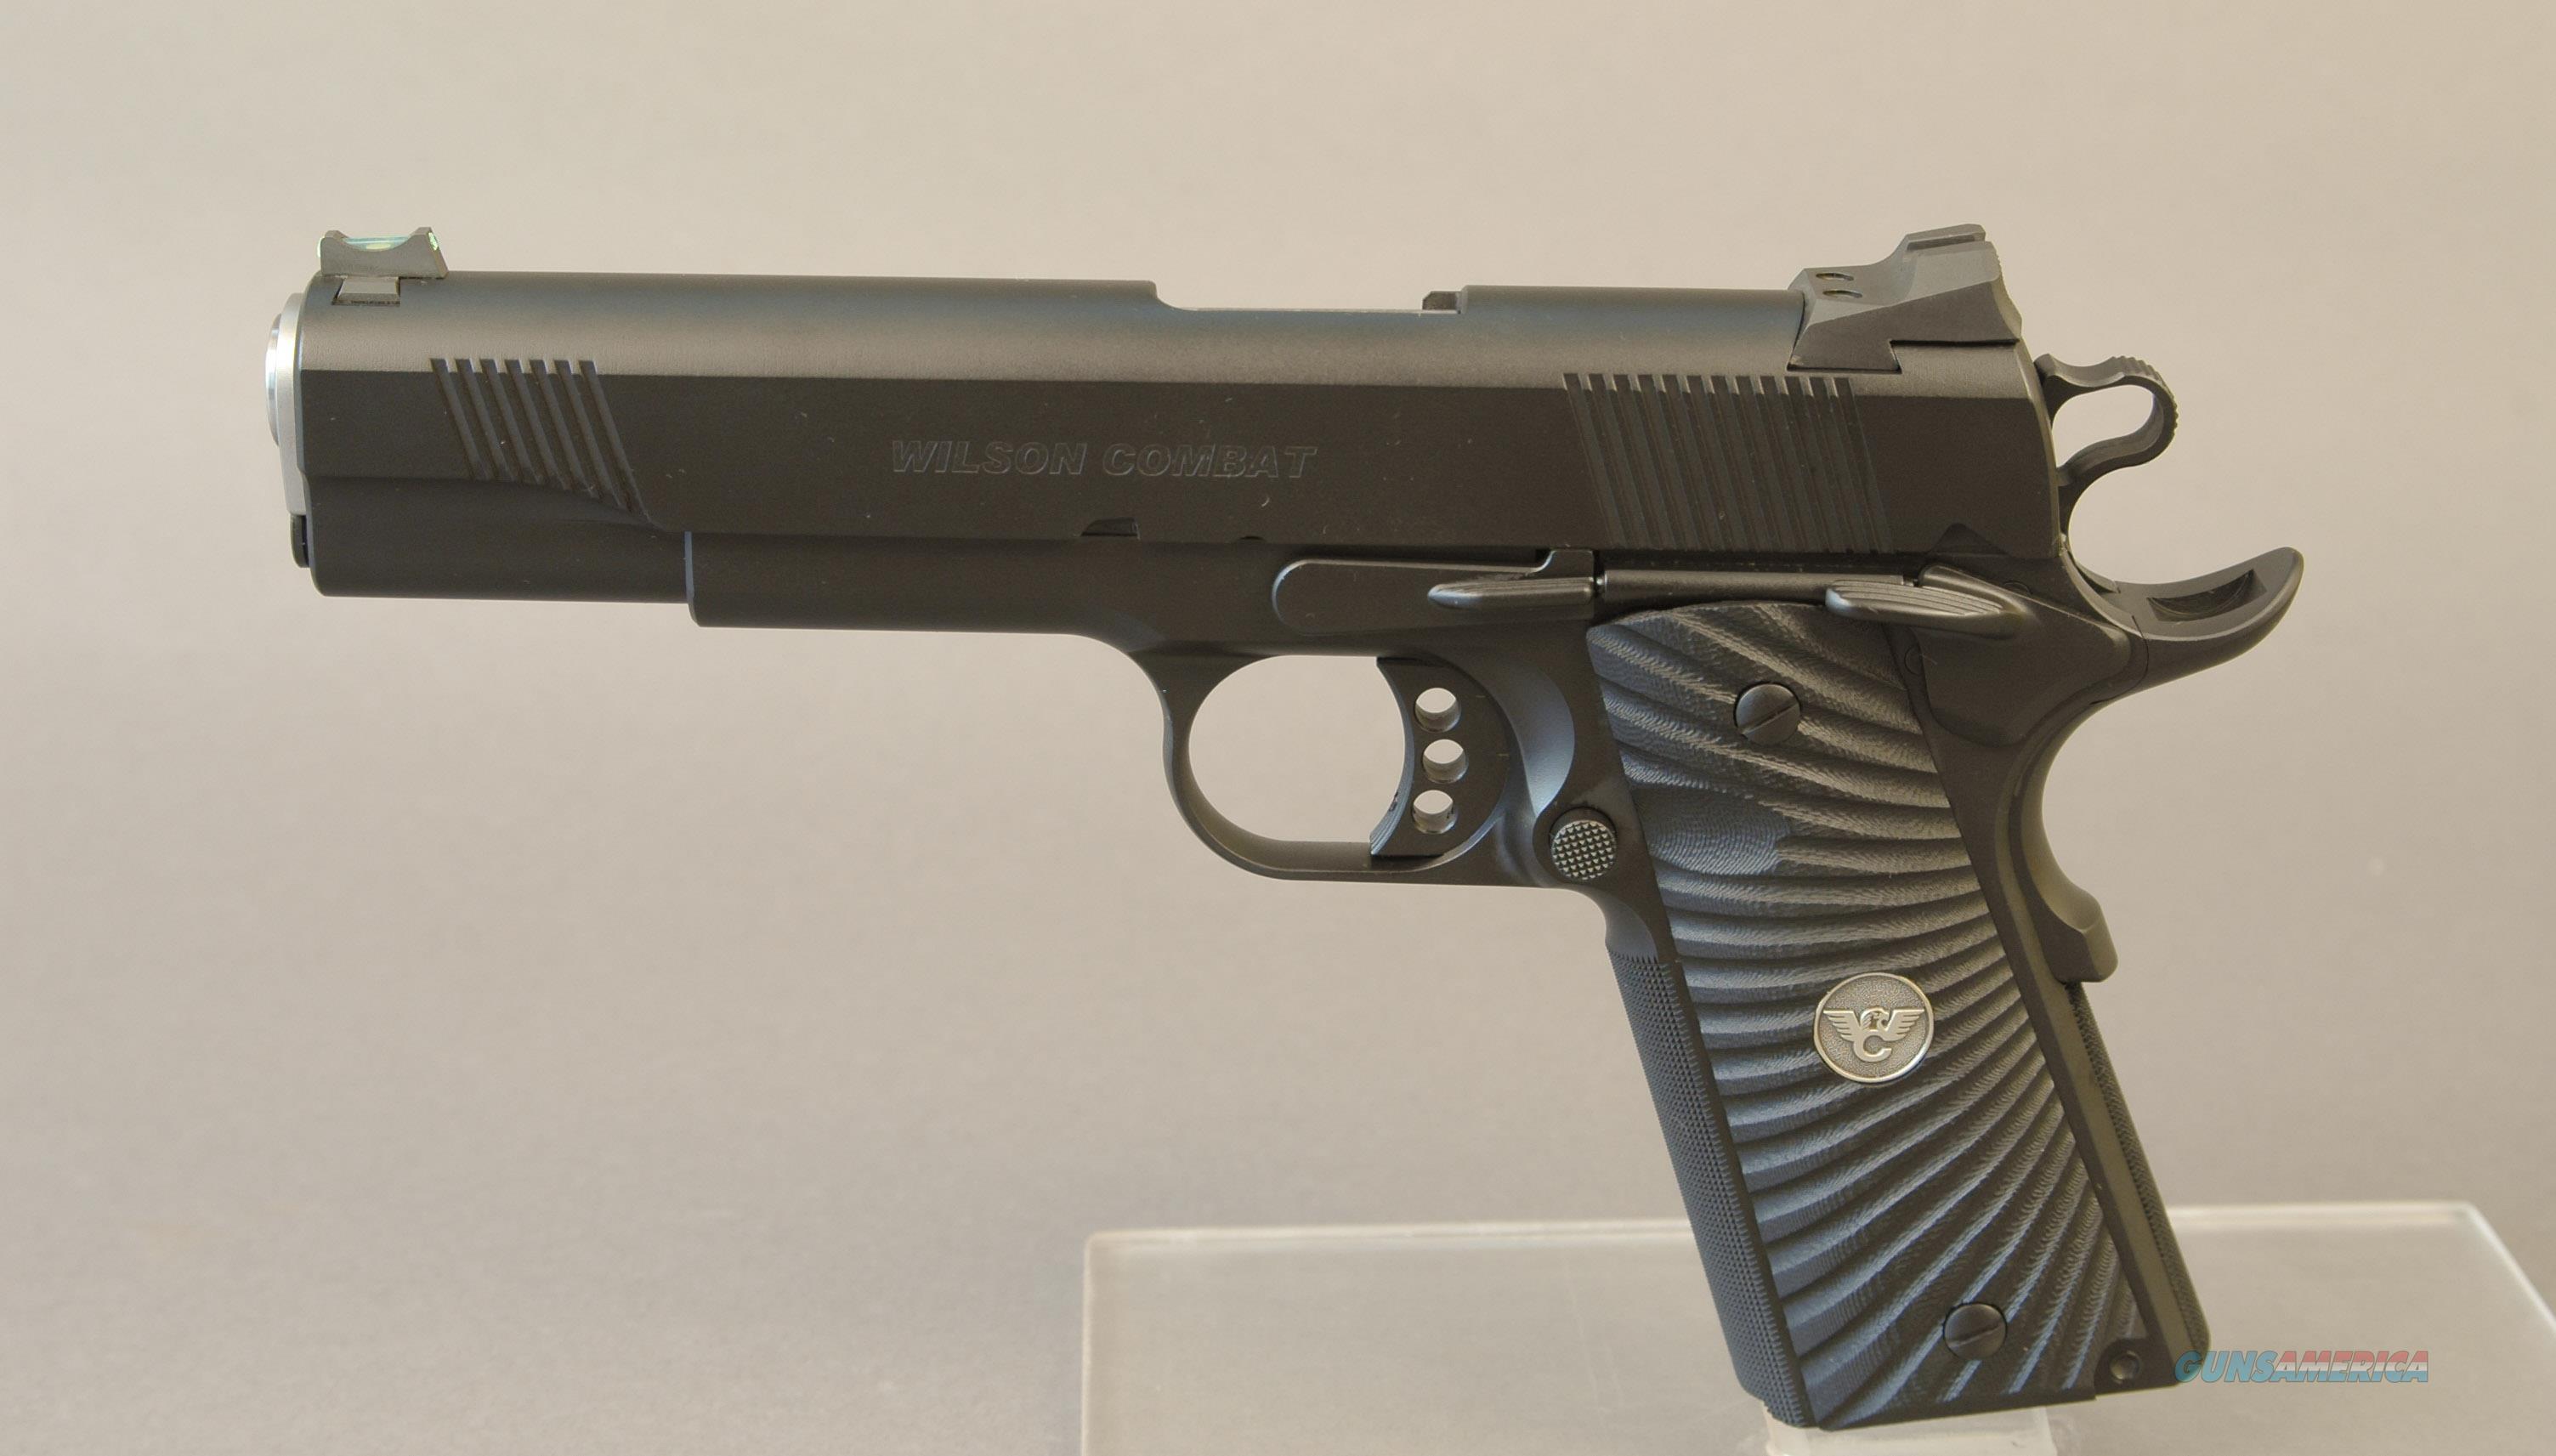 Wilson Combat CQB Armor-Tuff 45ACP   Guns > Pistols > Wilson Combat Pistols